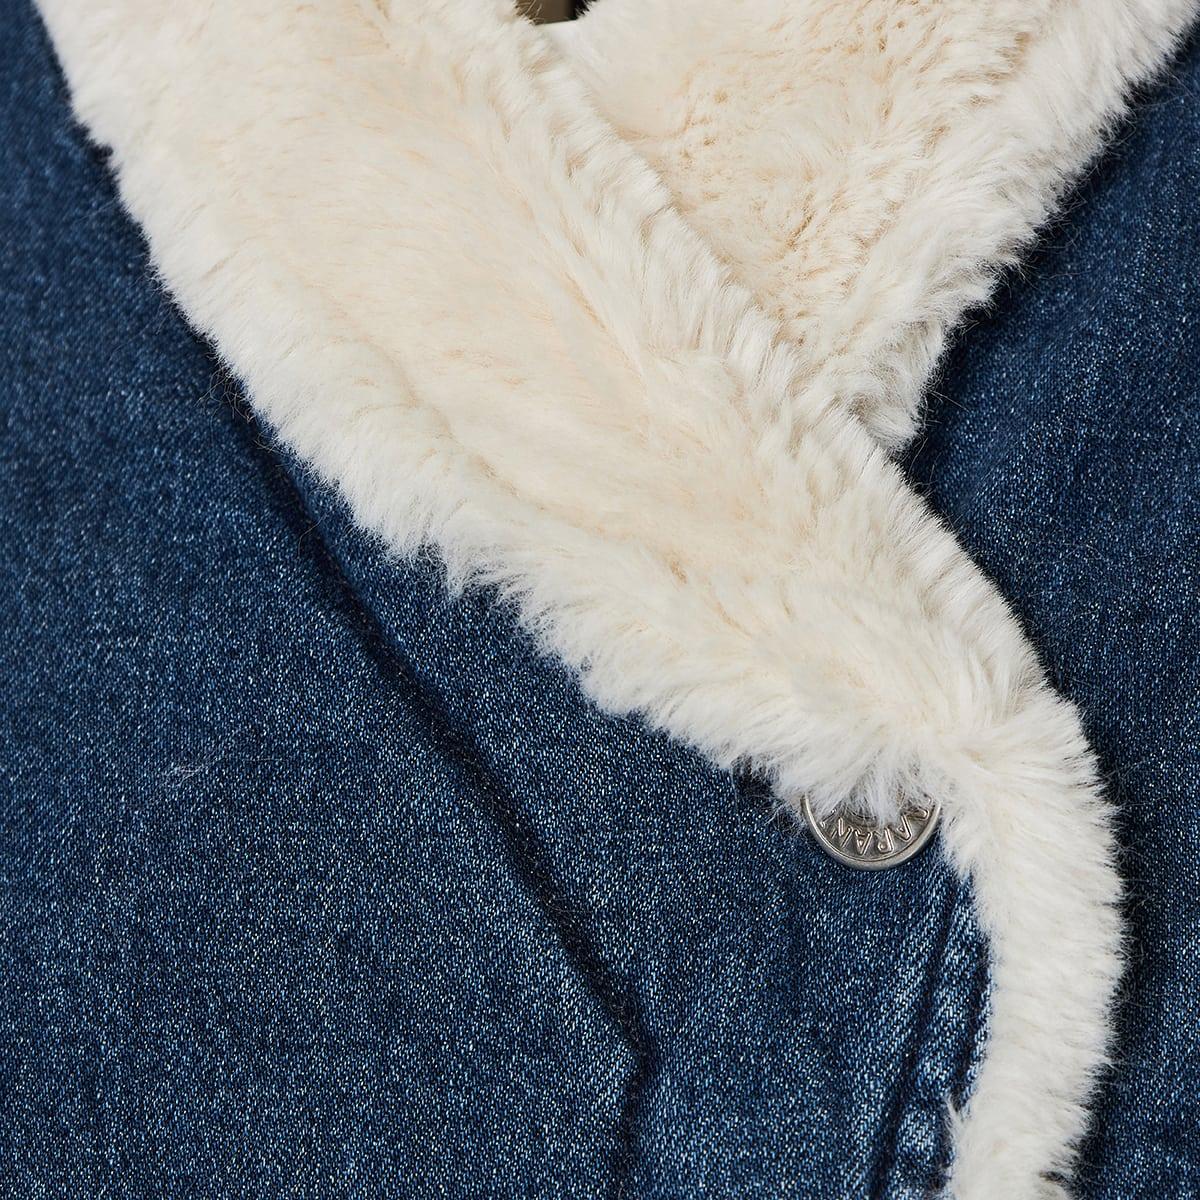 Dipauline faux fur and denim jacket